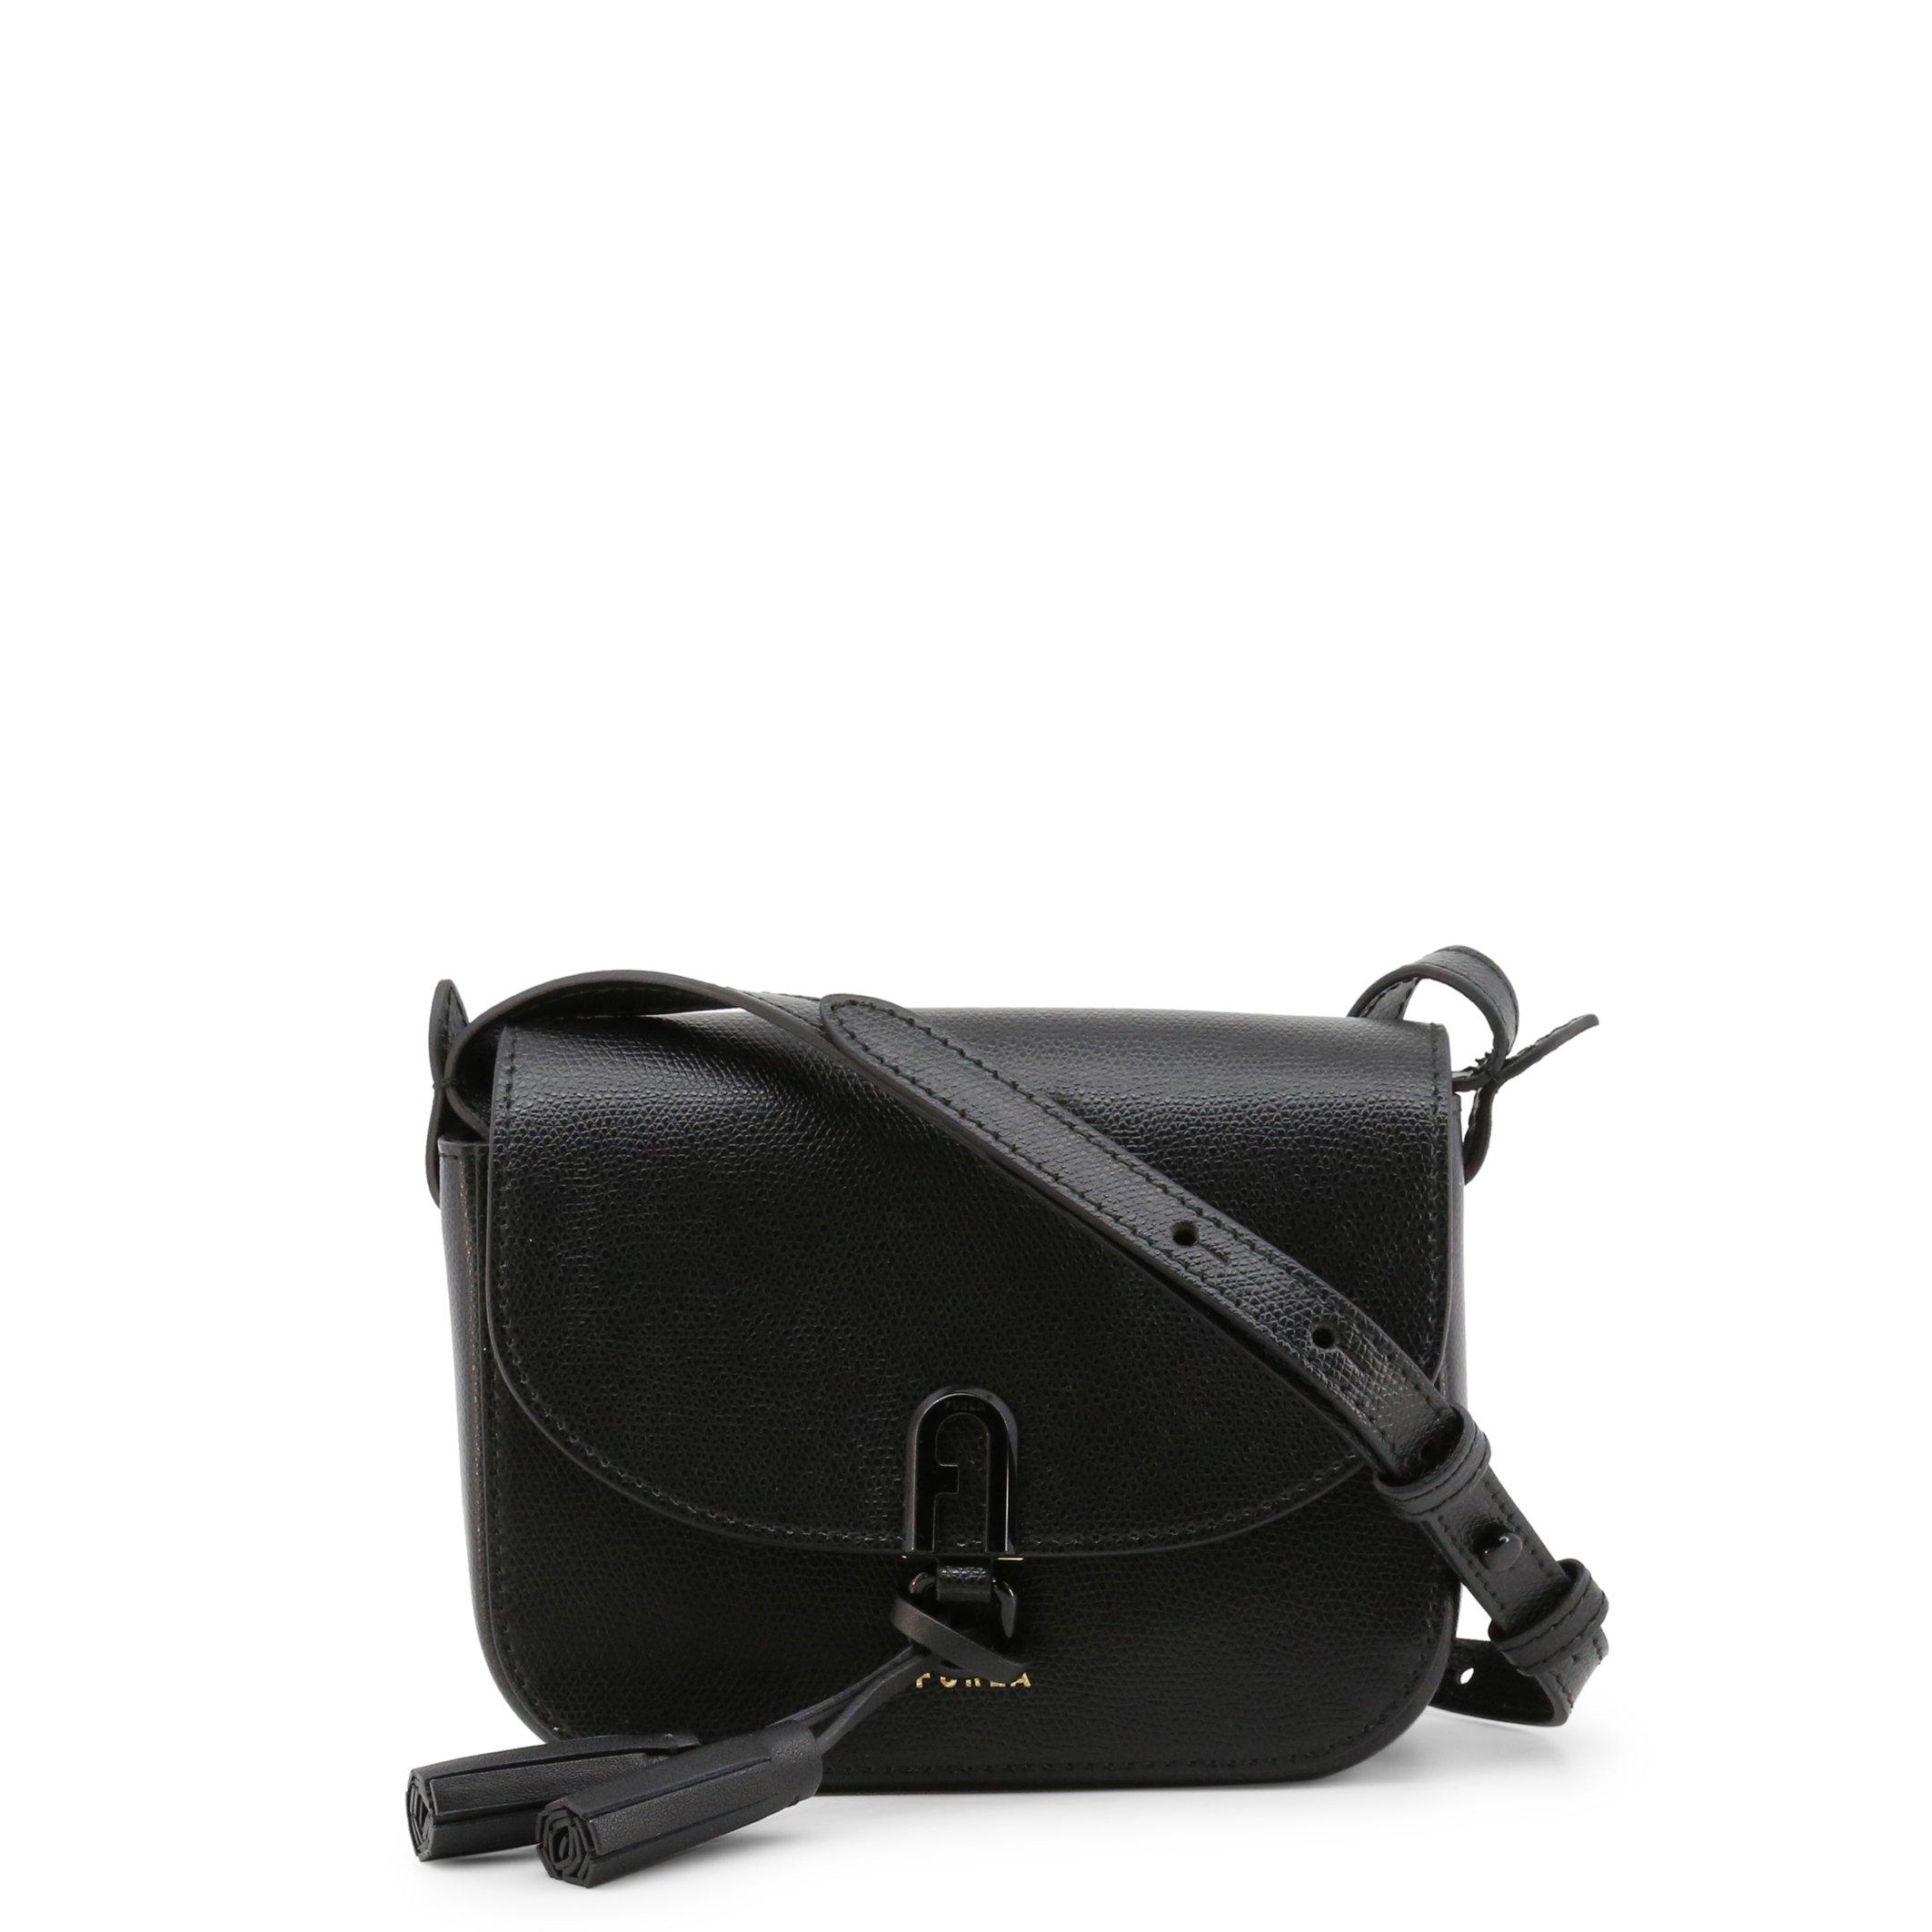 Furla Women's Crossbody Bag Various Colours FURLA-1927_FRANGIA - black NOSIZE